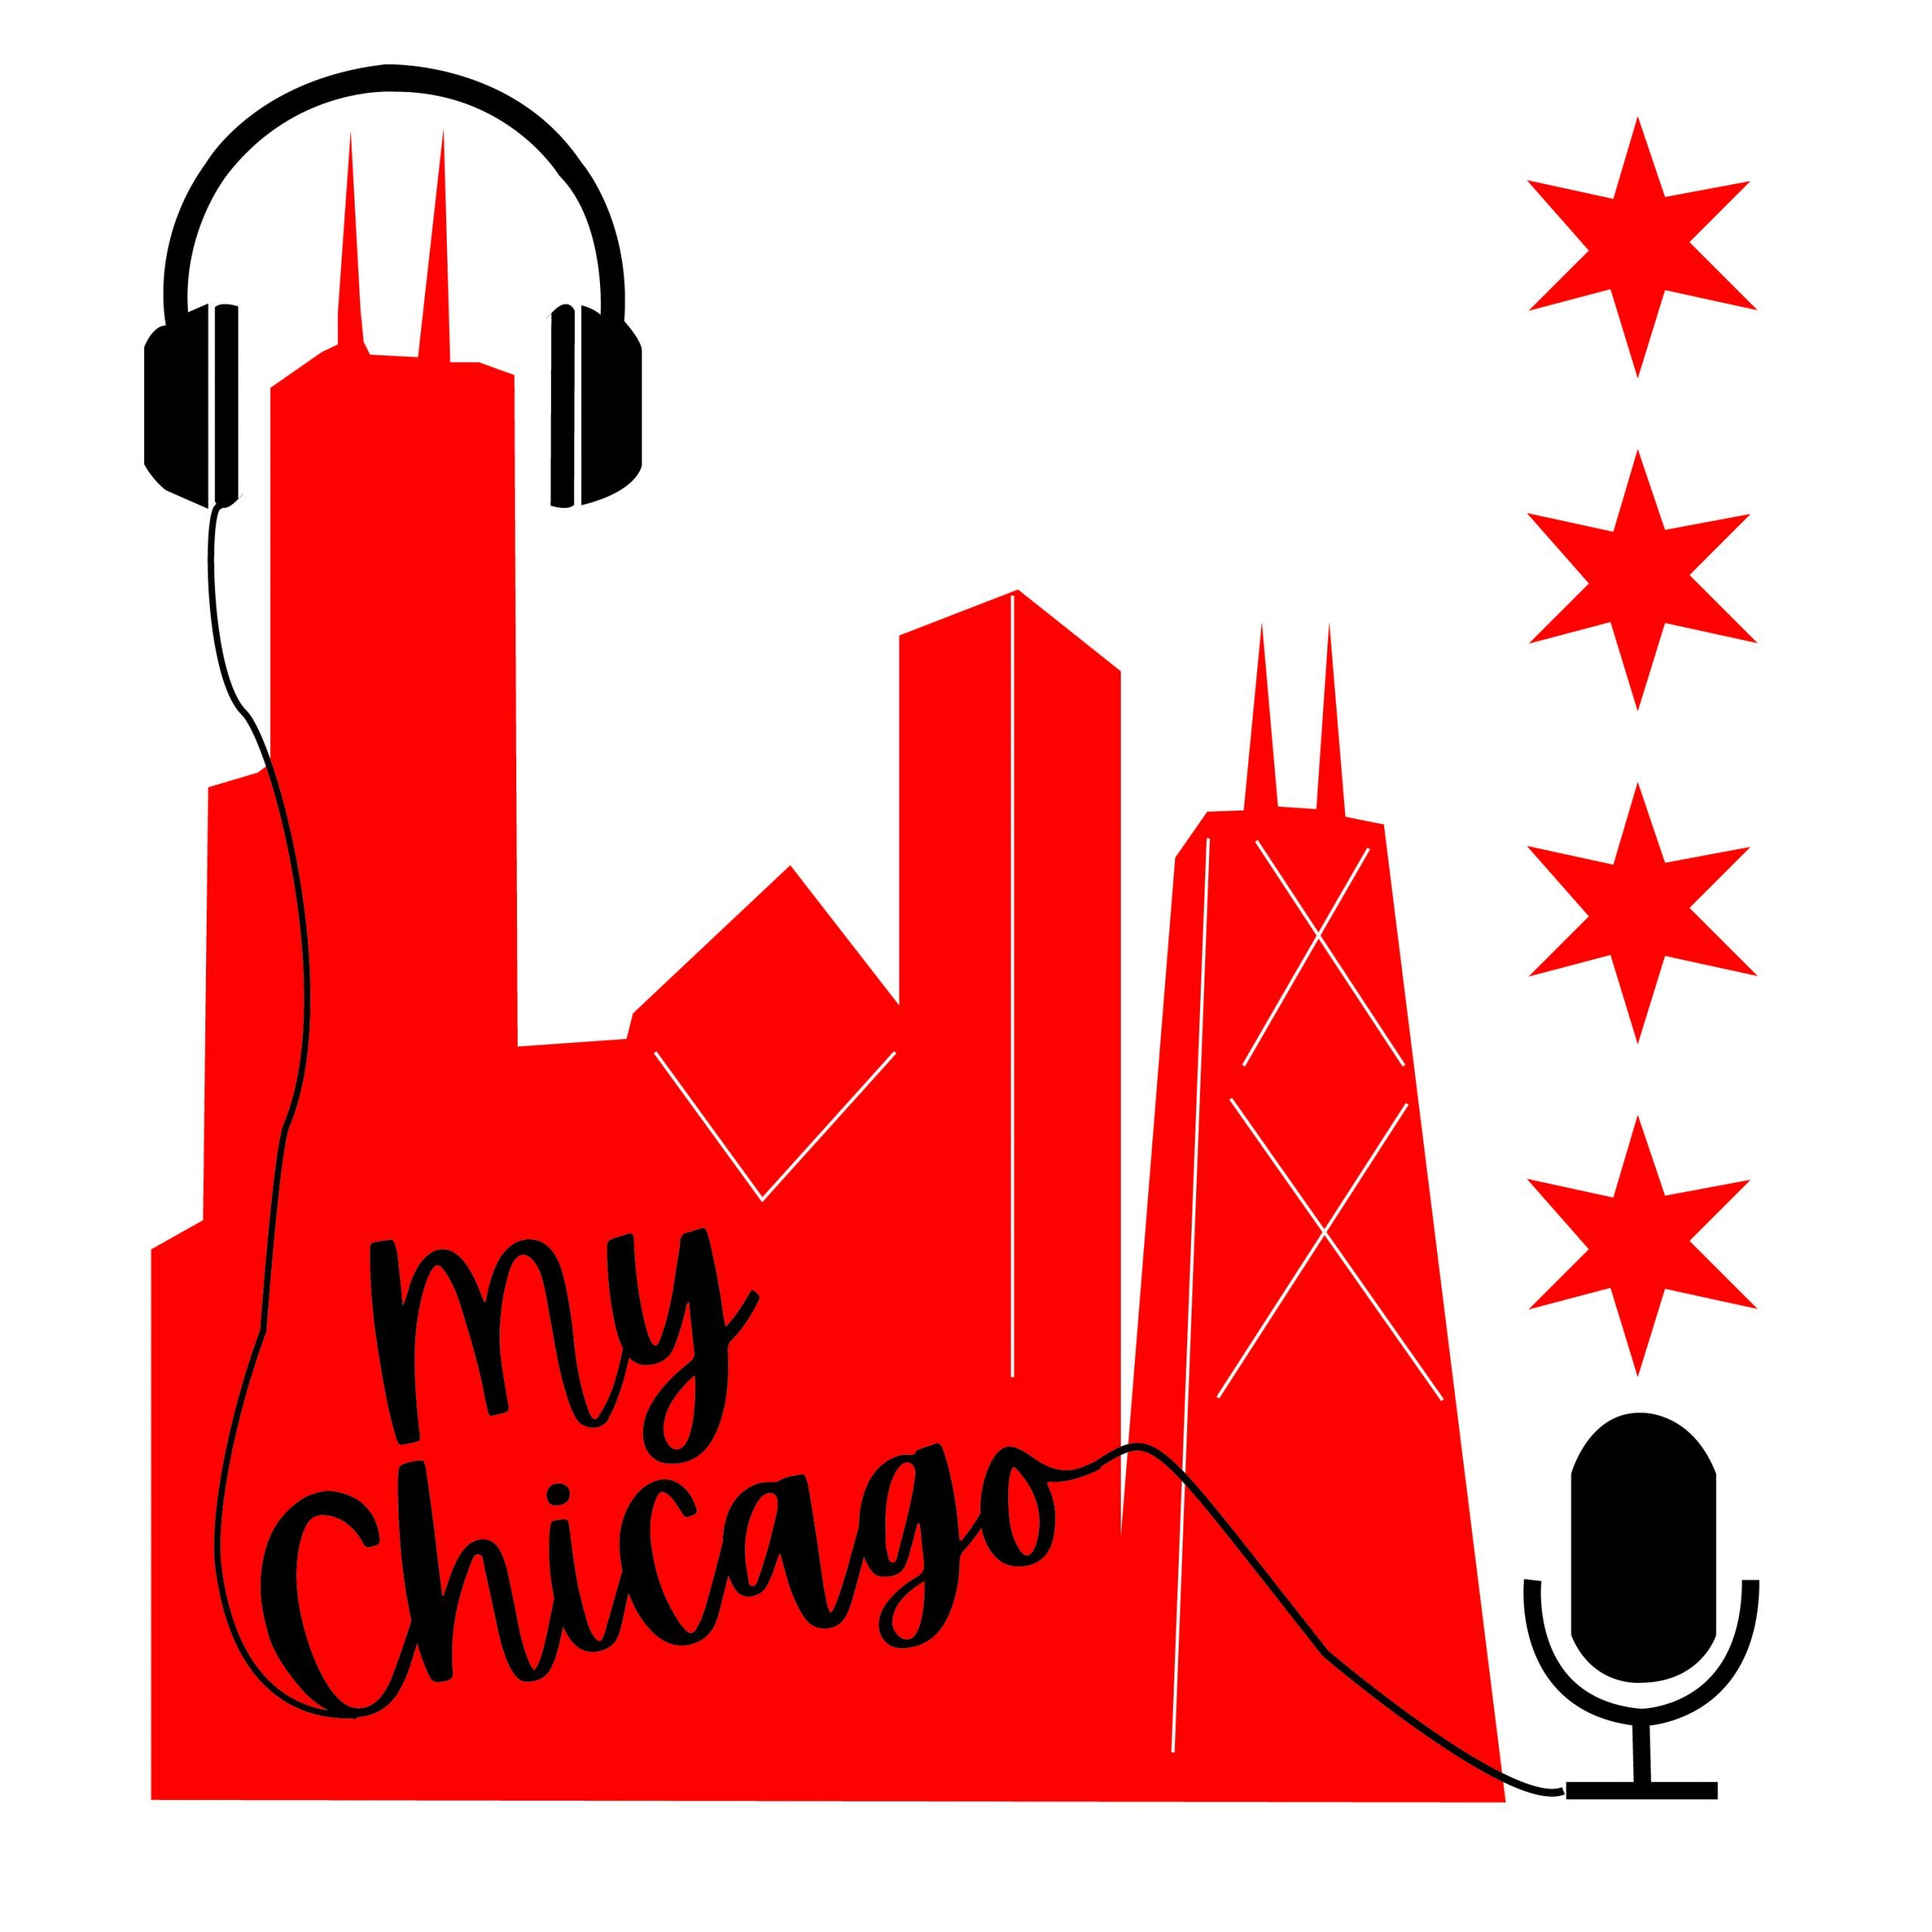 My Chicago